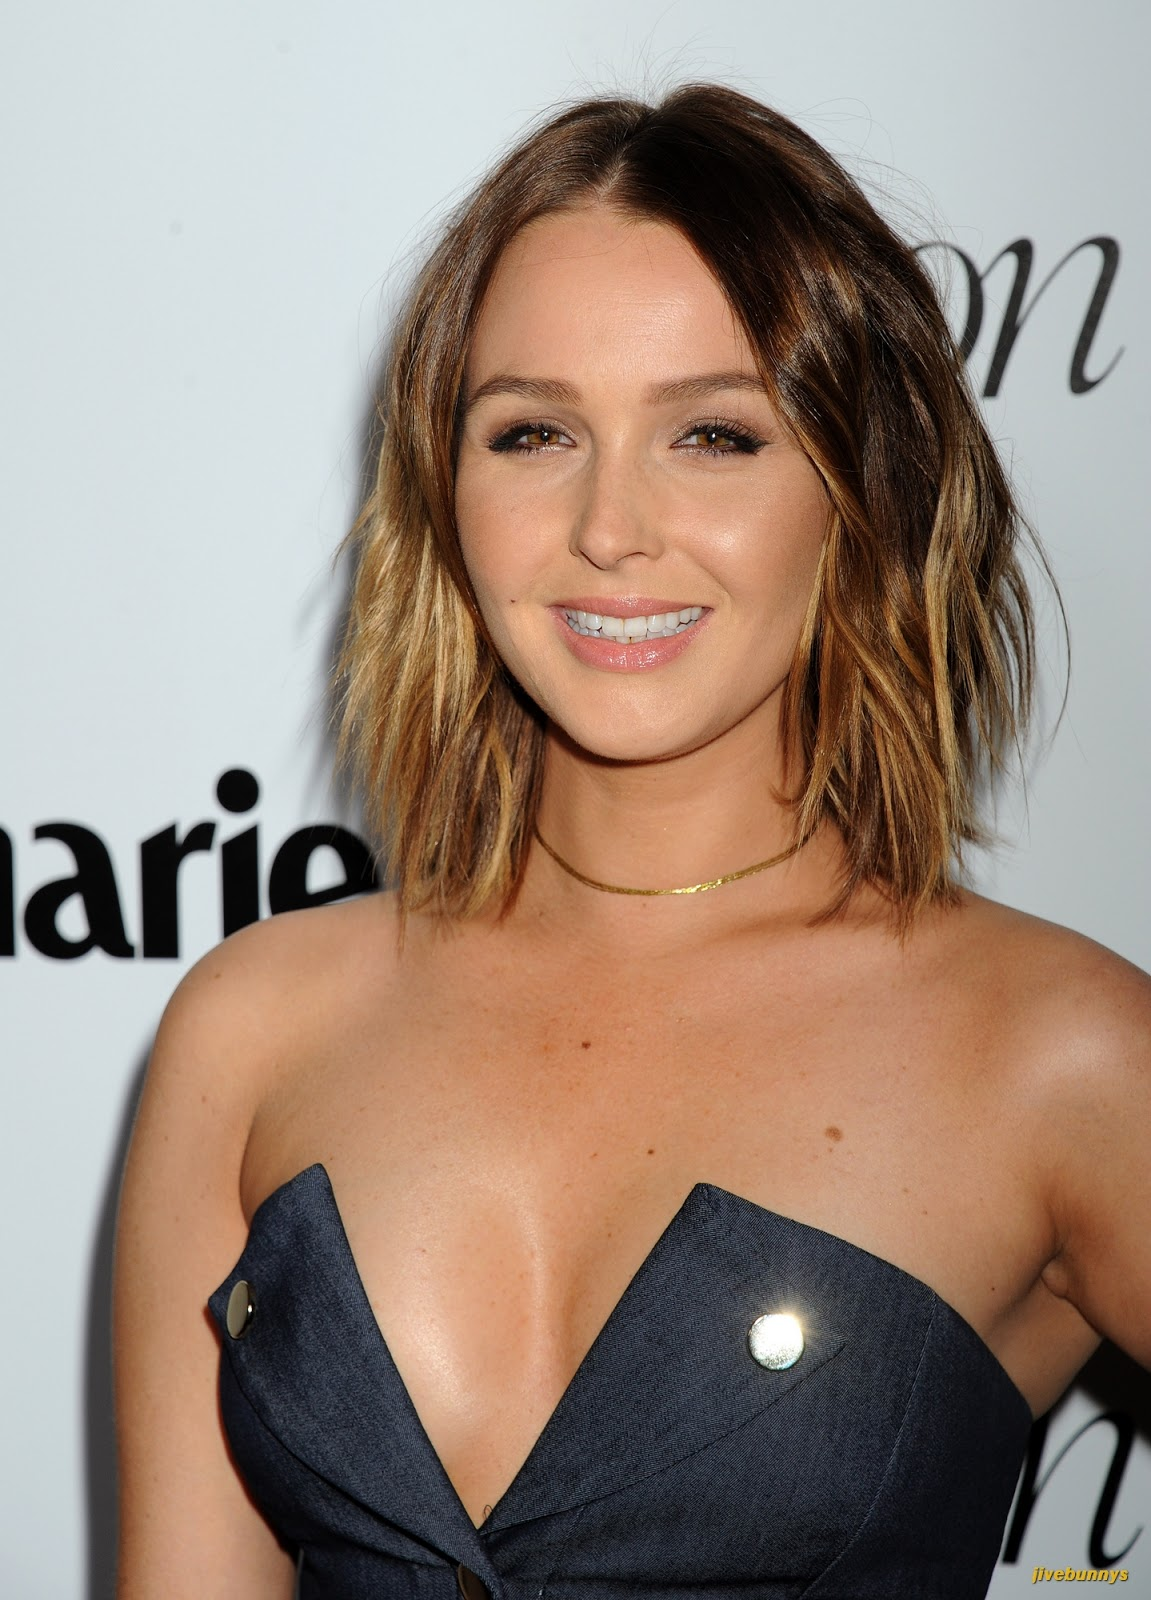 Hot Camilla Luddington nude (39 photos), Tits, Leaked, Instagram, swimsuit 2019